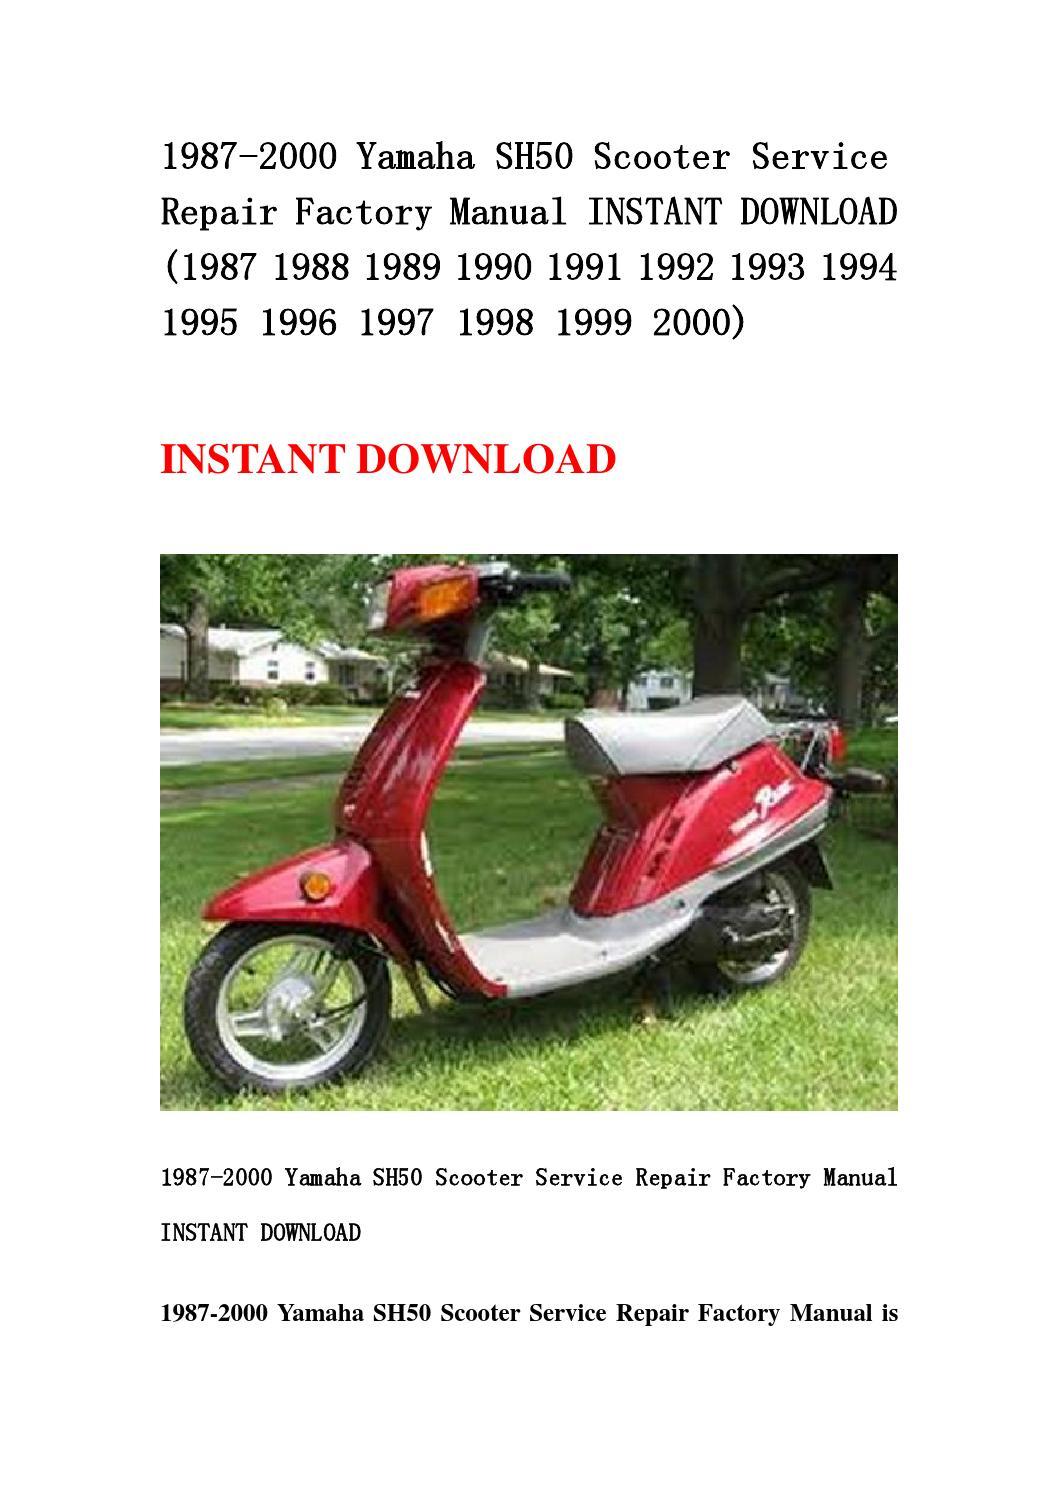 1987 2000 Yamaha Sh50 Scooter Service Repair Factory